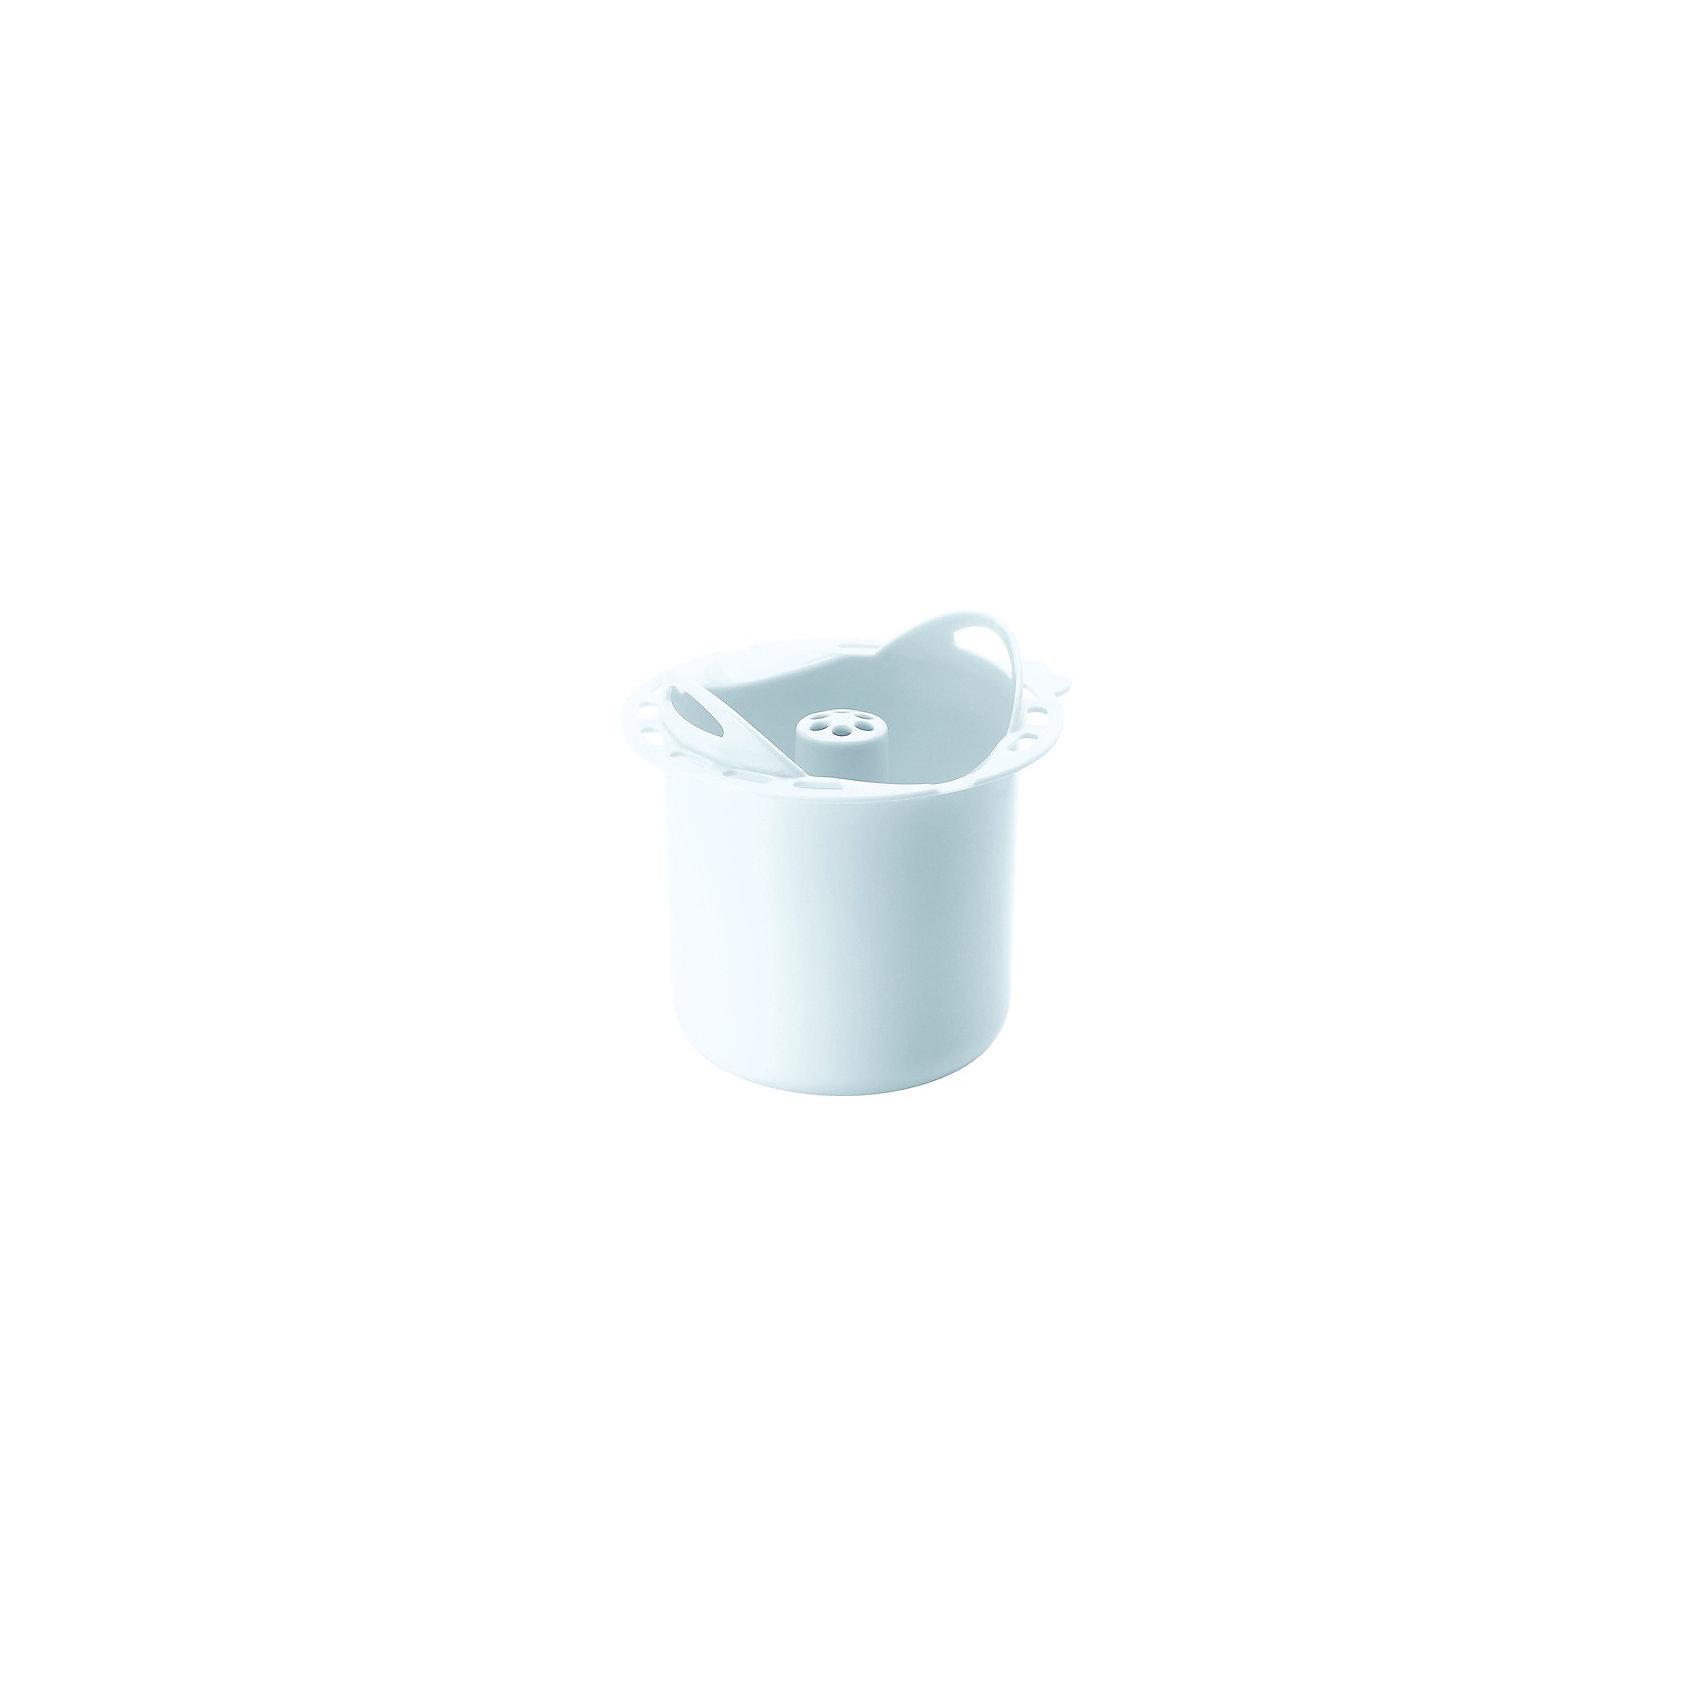 BEABA Контейнер для варки круп BBK, Beaba, белый